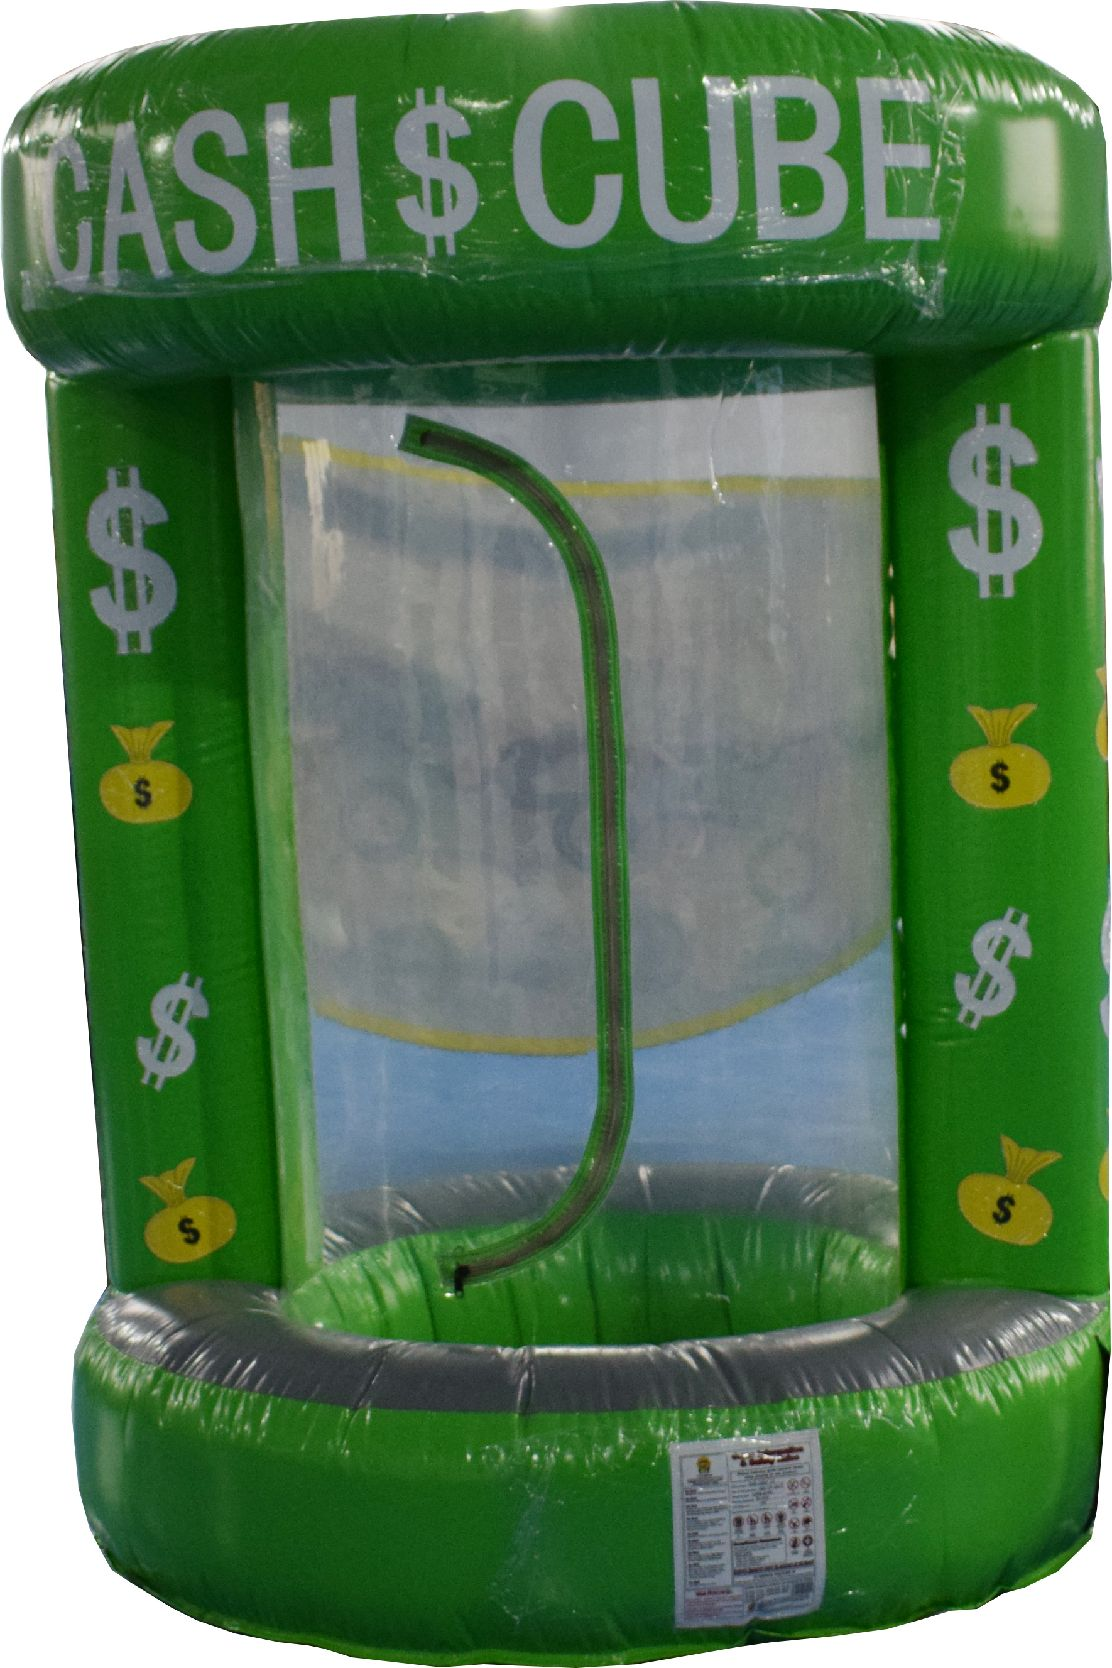 Cash-cube-rental-mainne-new-hamsphire-